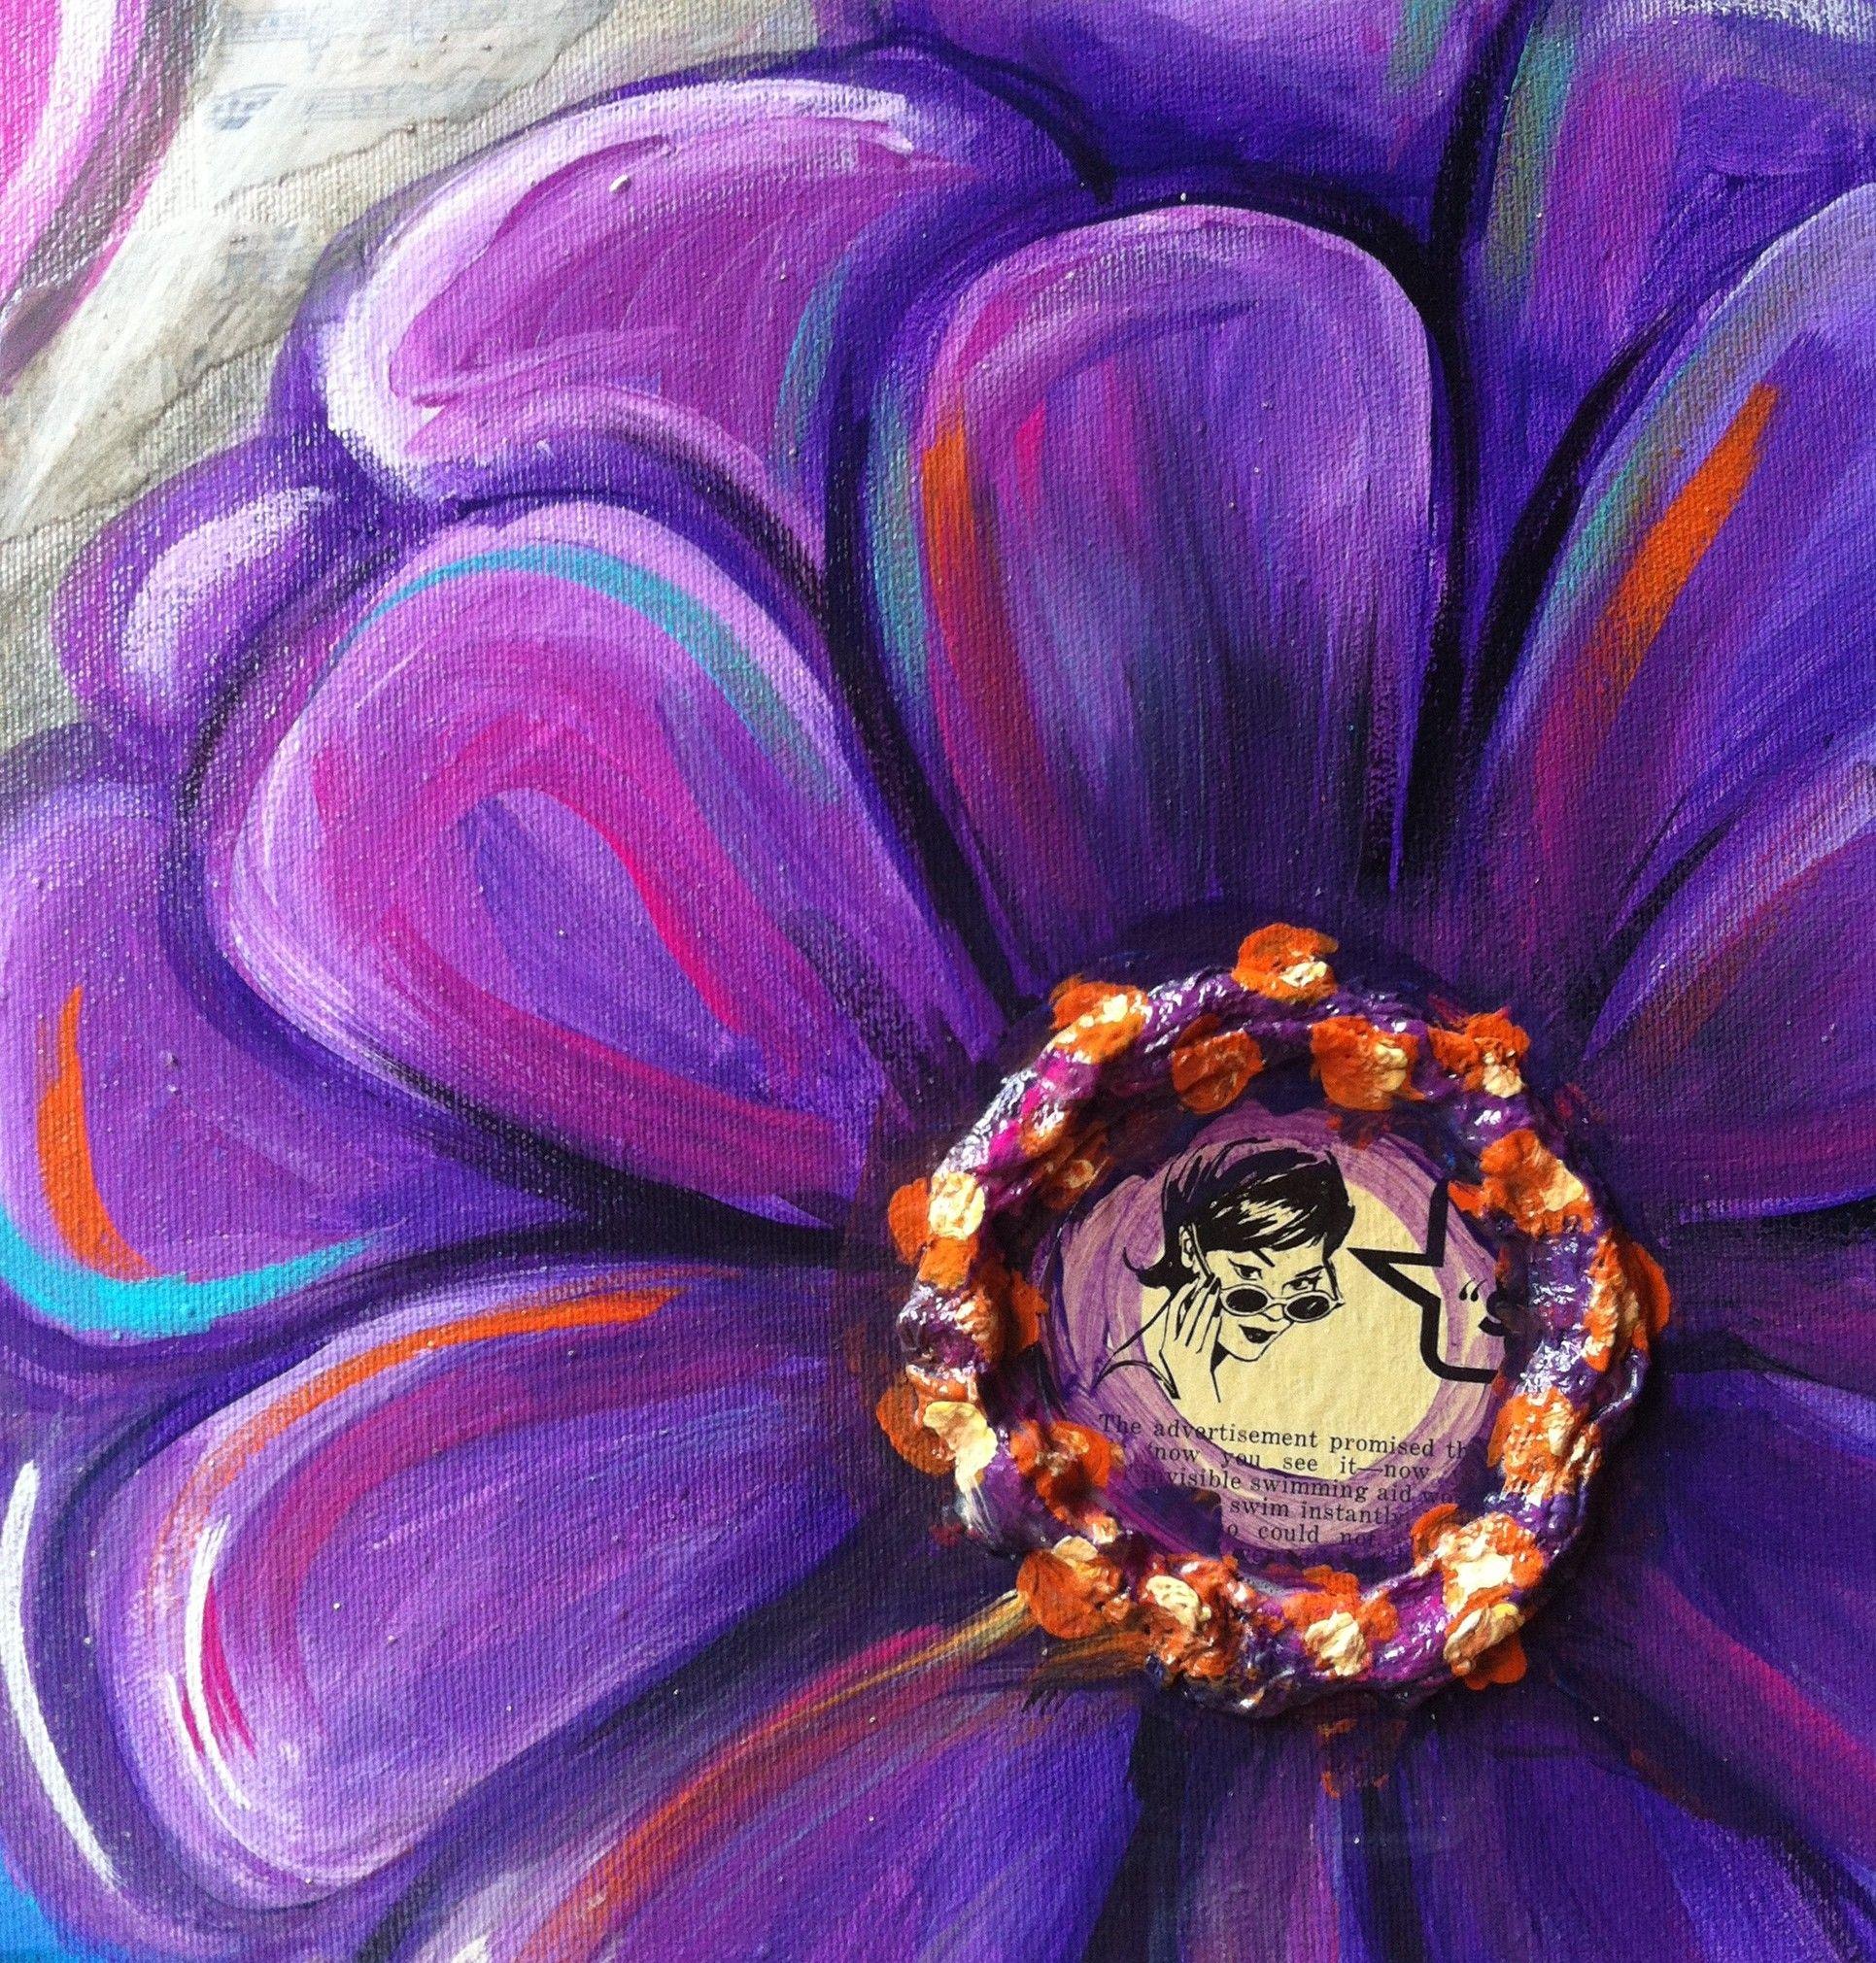 Purple Flower Detail E1372365494848 (1931 2021)